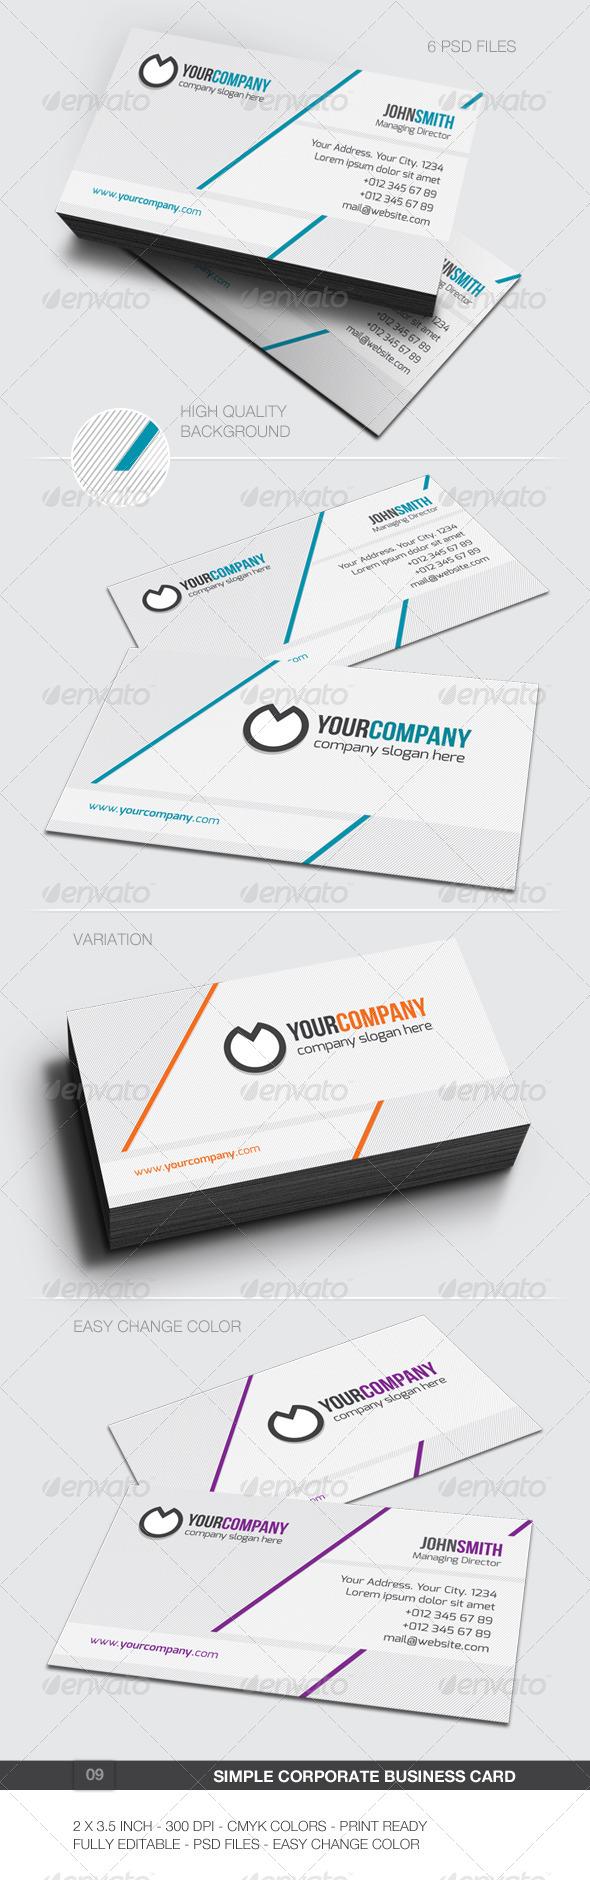 Simple Corporate Business Card - 09 - Corporate Business Cards